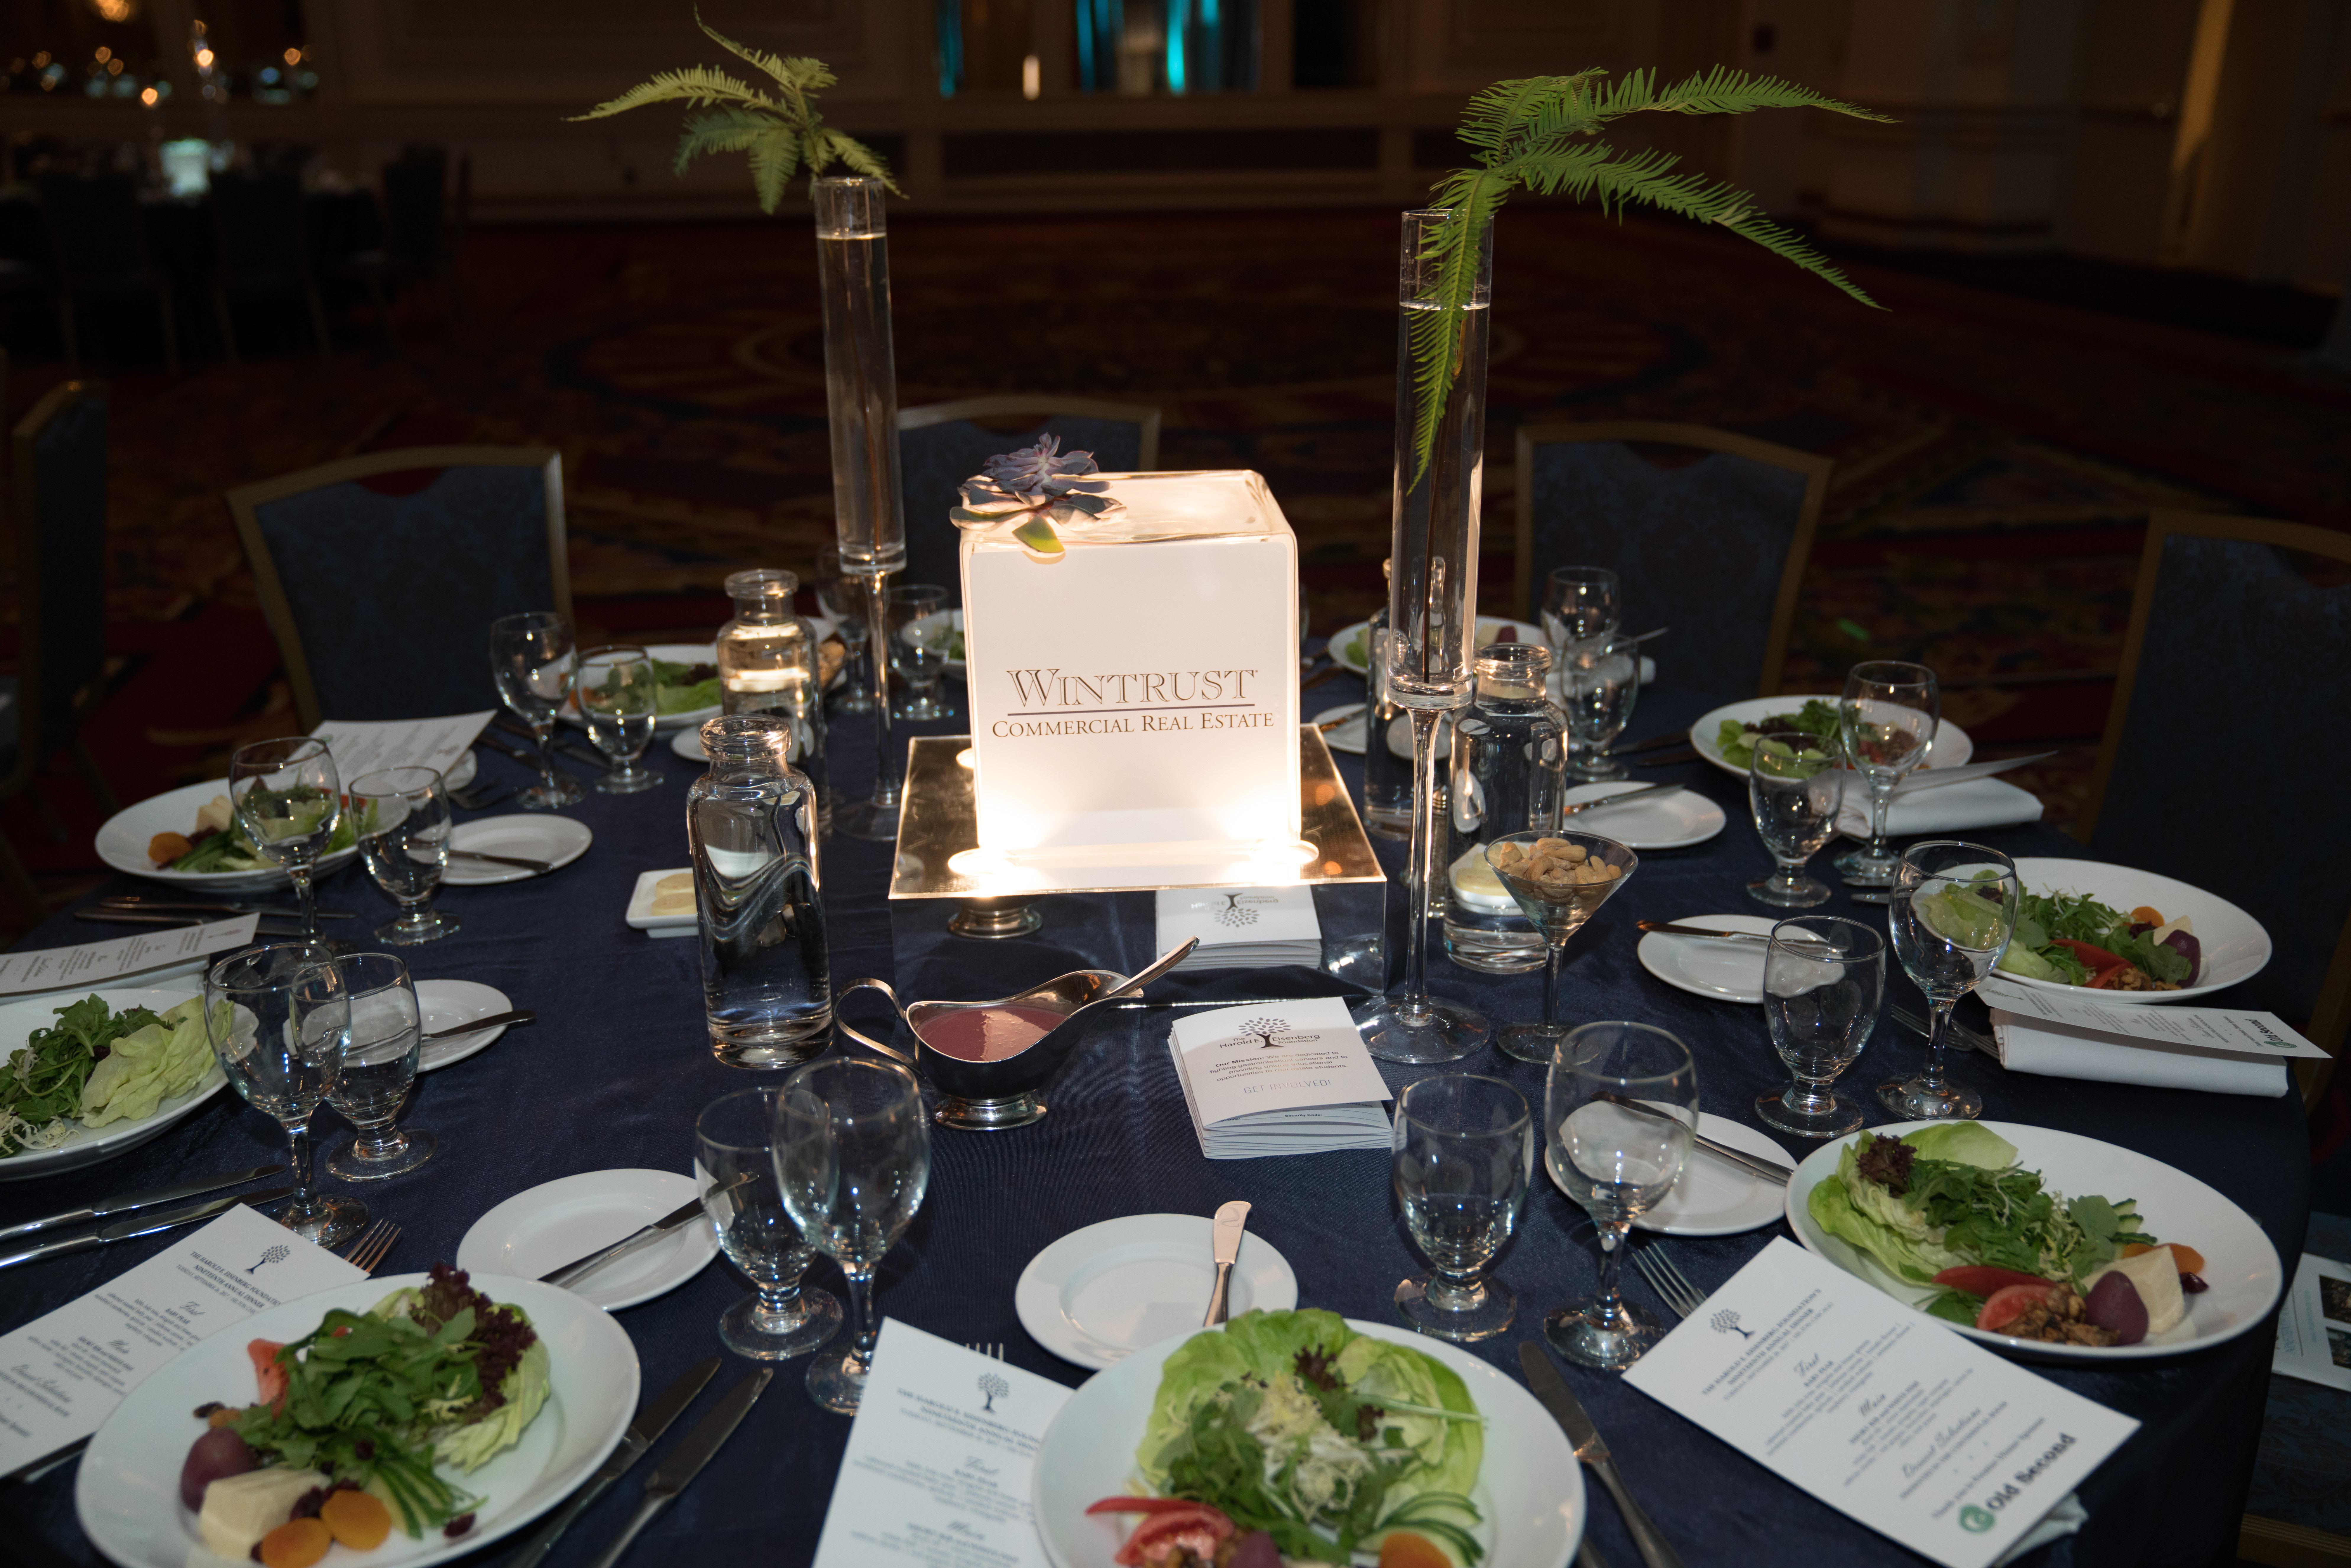 Eisenberg Foundation Gala - Erin McDonald Co